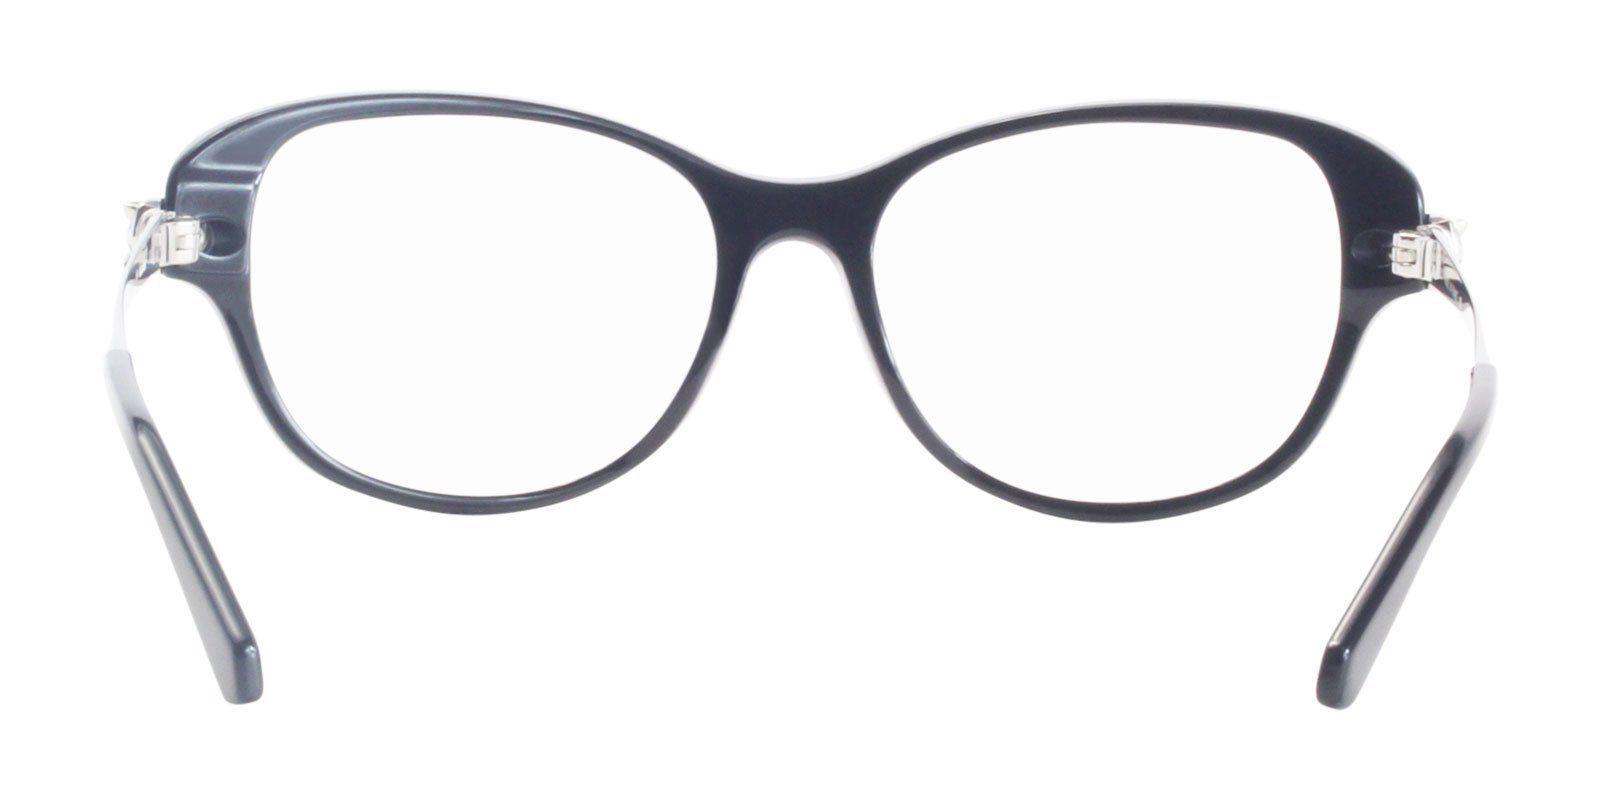 353ab9d9d0e2 Cartier - Panthere Wild EYE00024 eyeglasses